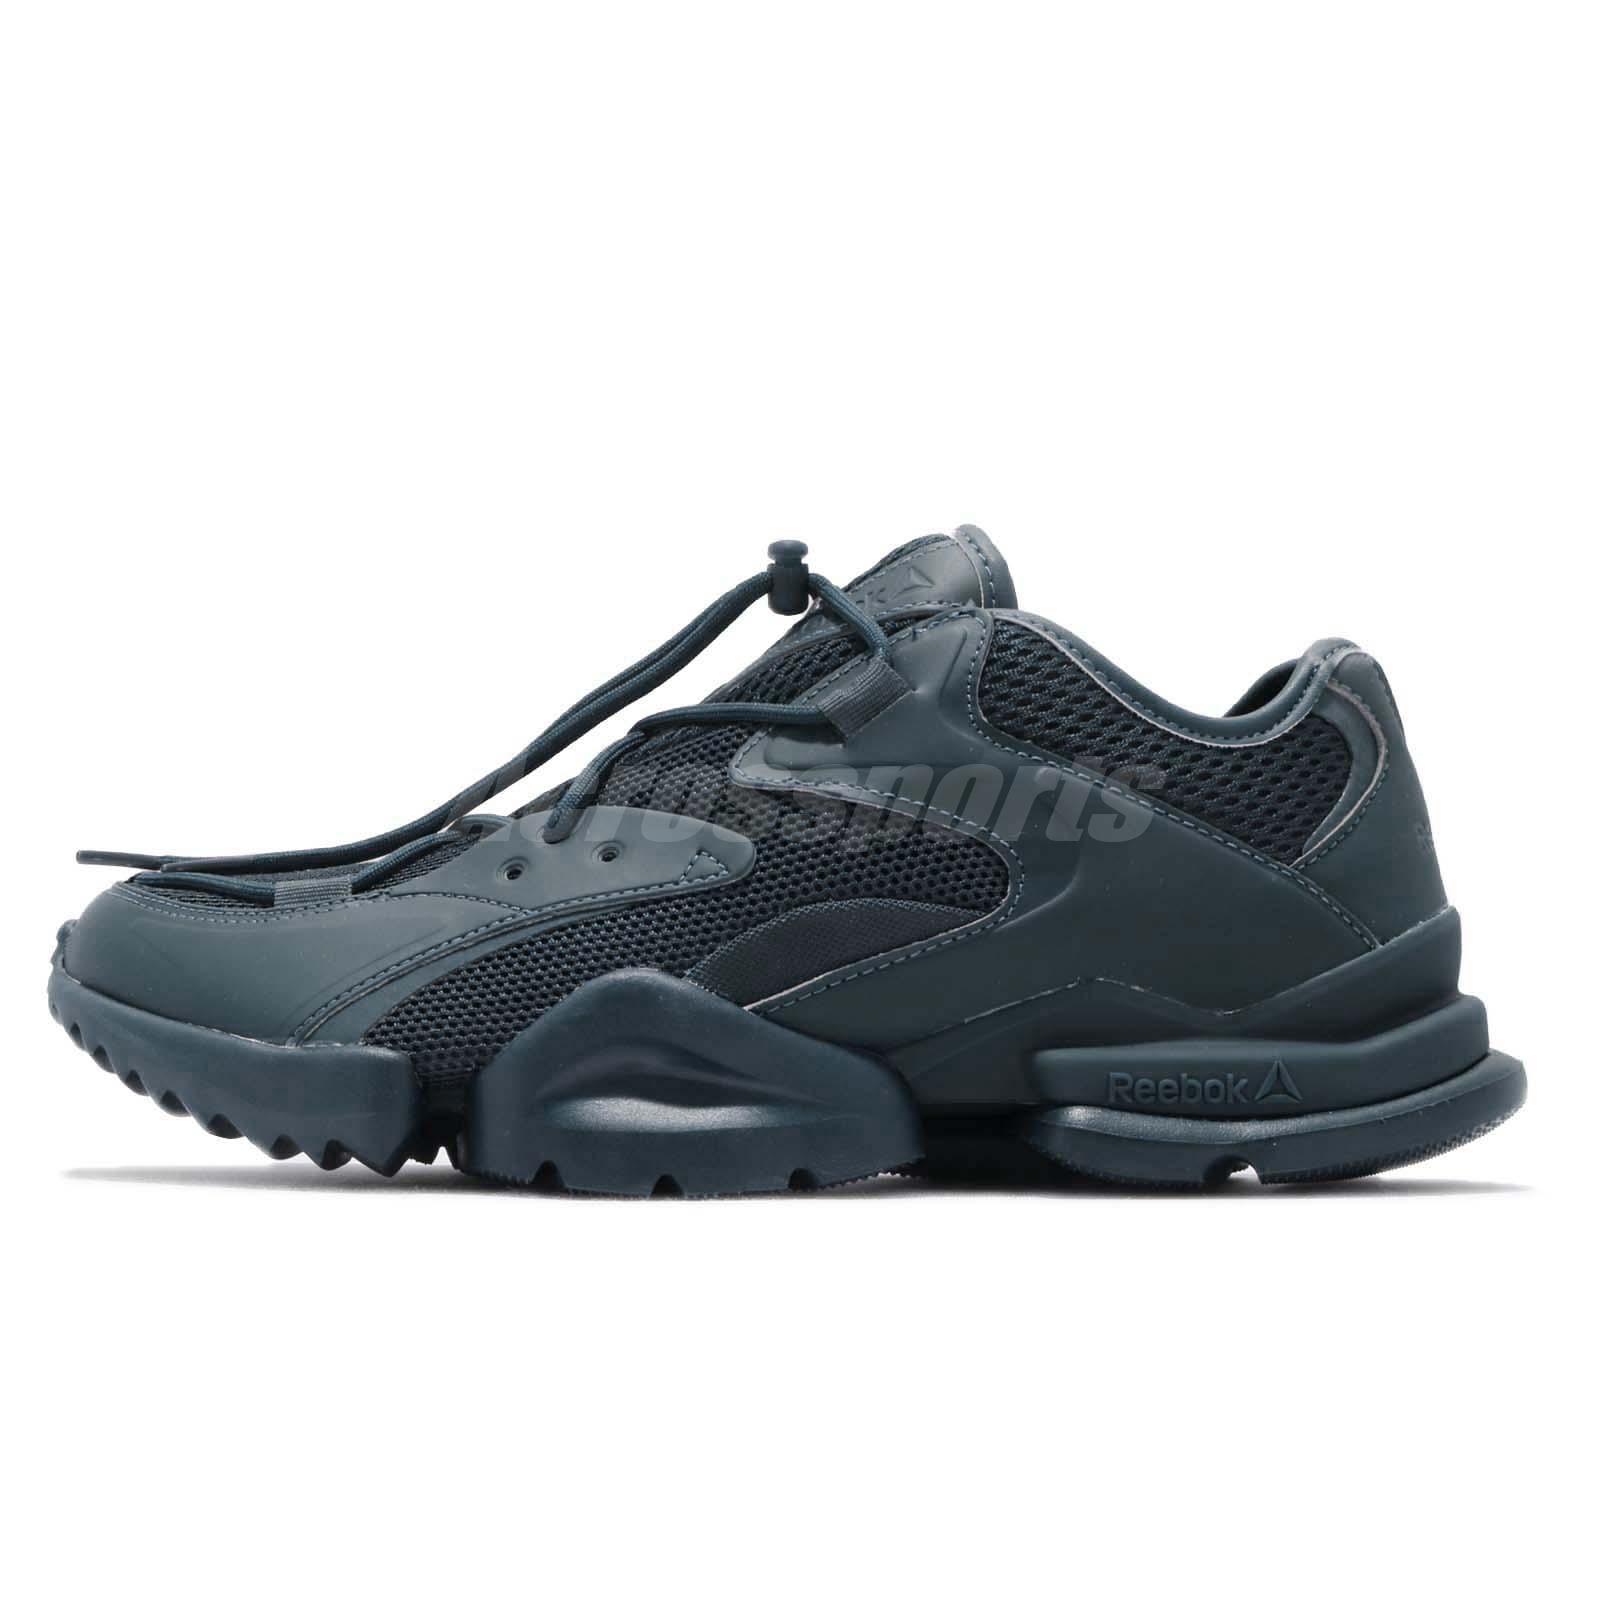 0863d48aa9c122 Reebok Run R 96 Blue Men Running Casual Lifestyle Chunky Shoes Sneakers  DV5205